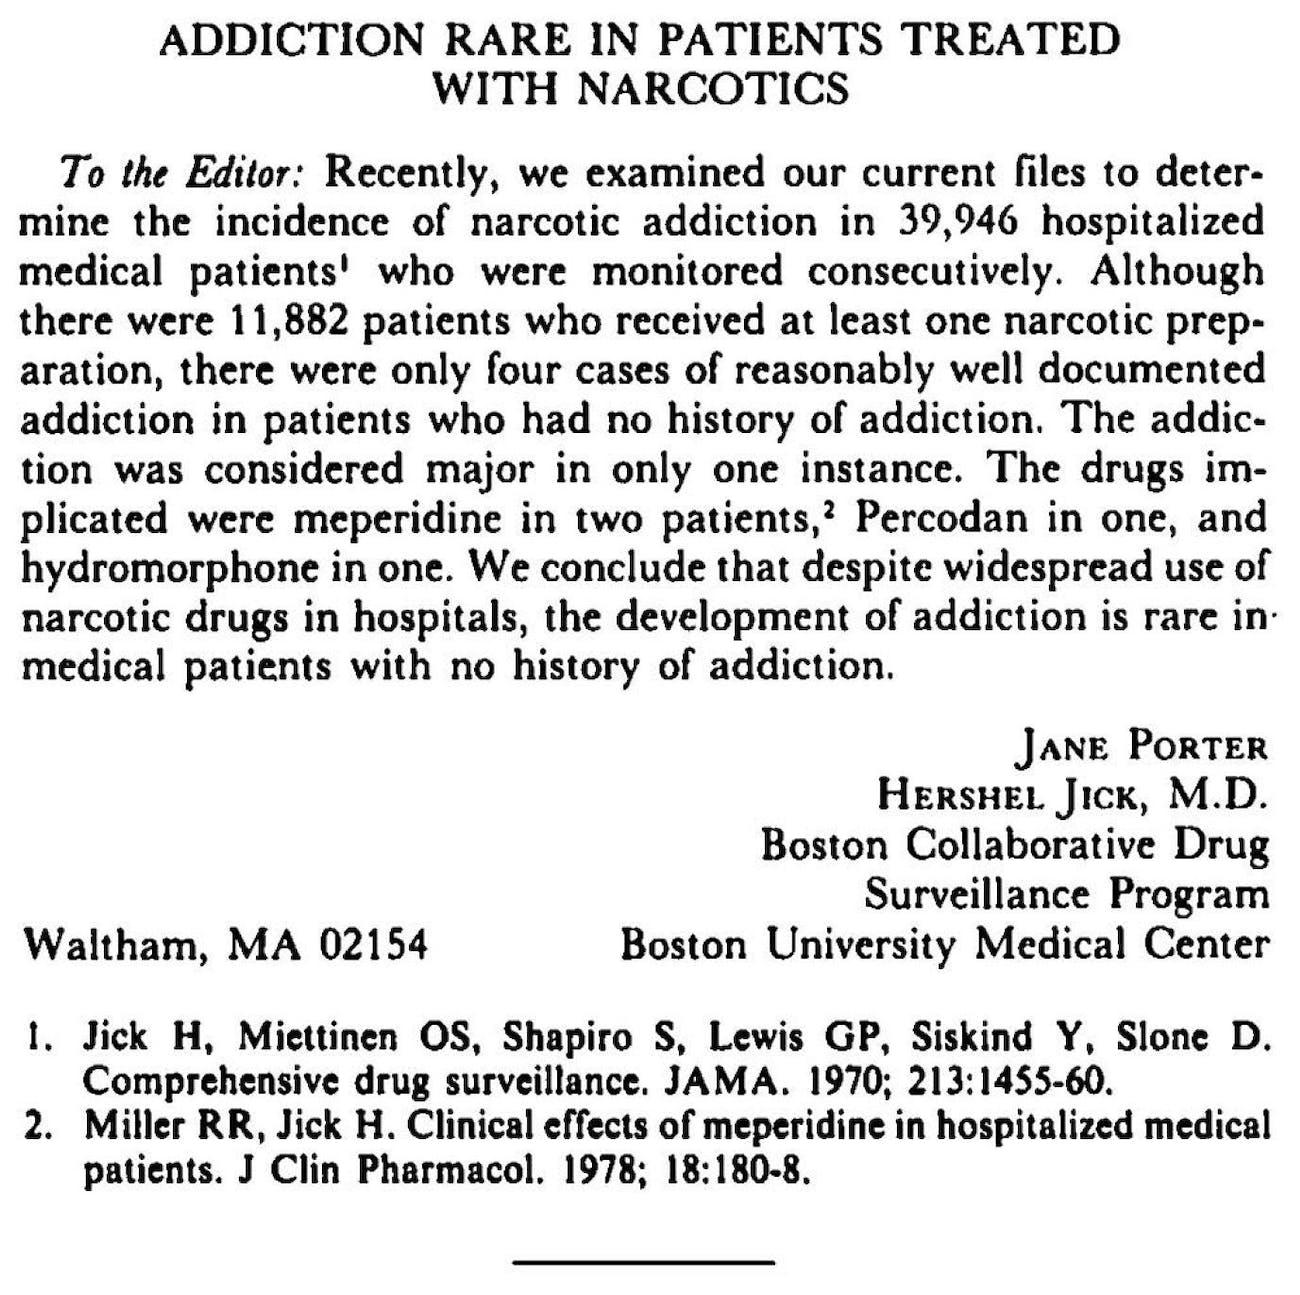 New England Journal of Medicine NEJM opioid letter 1980